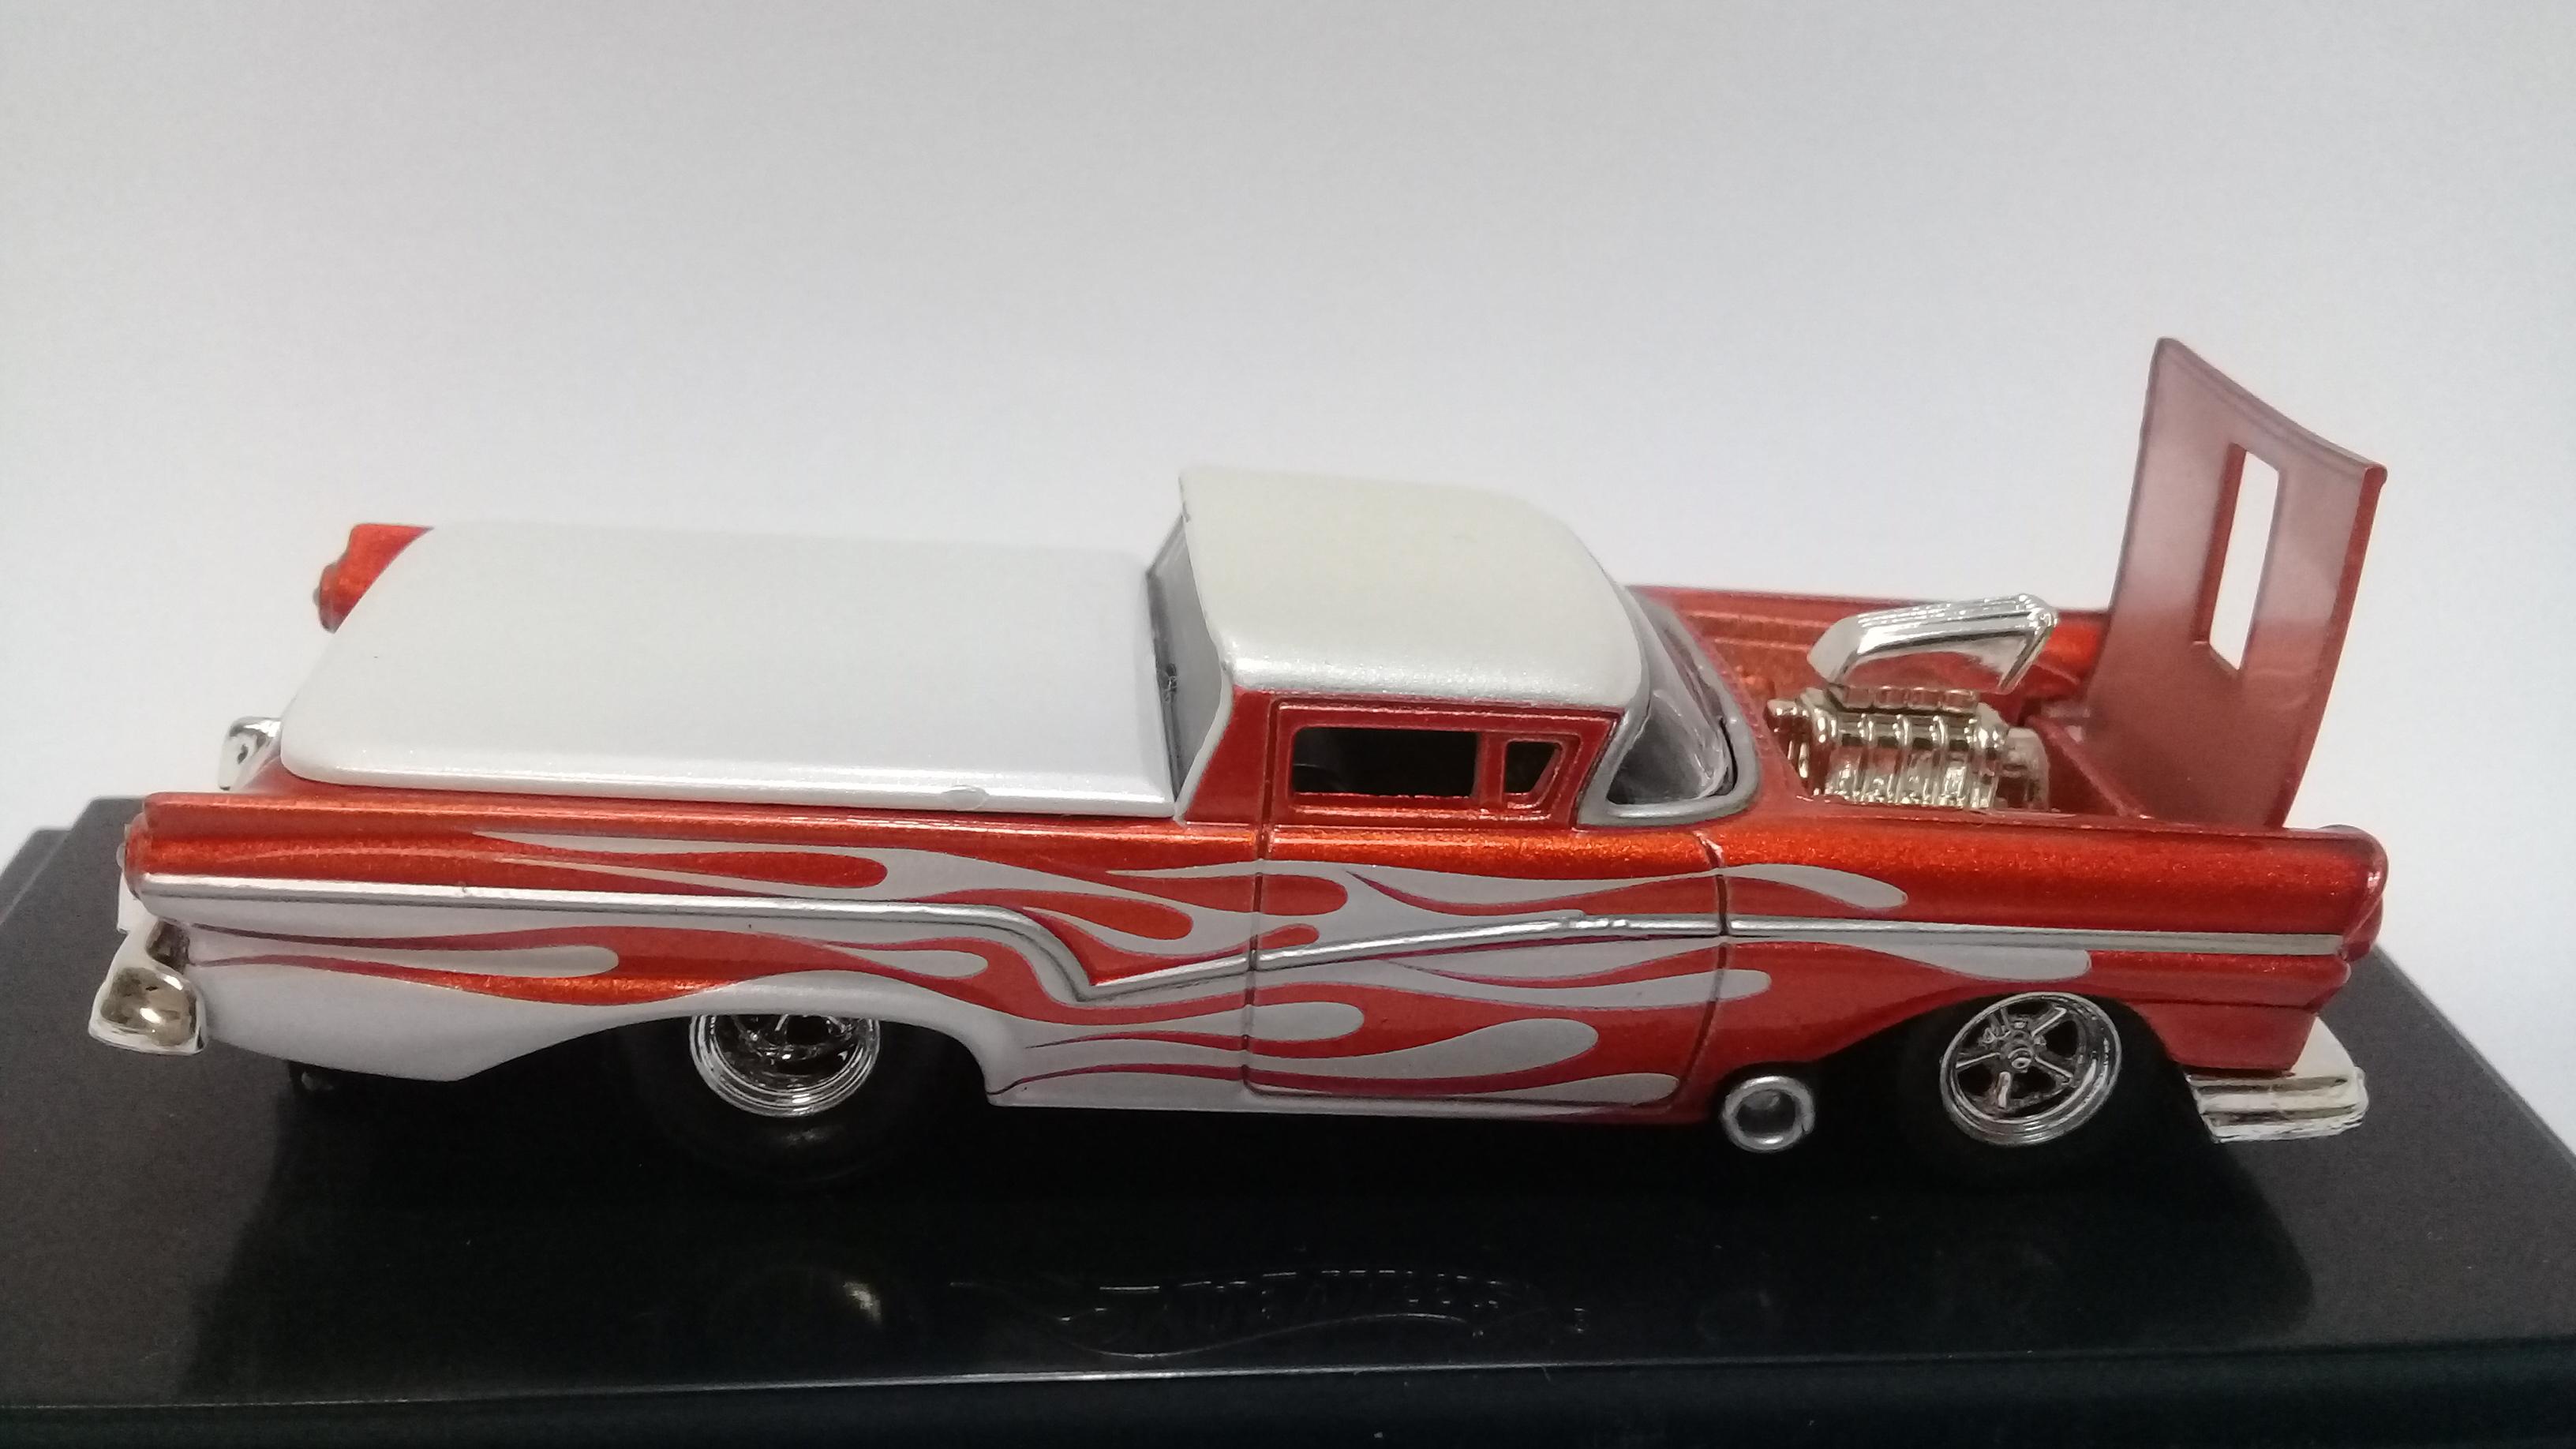 '57 Ford Ranchero